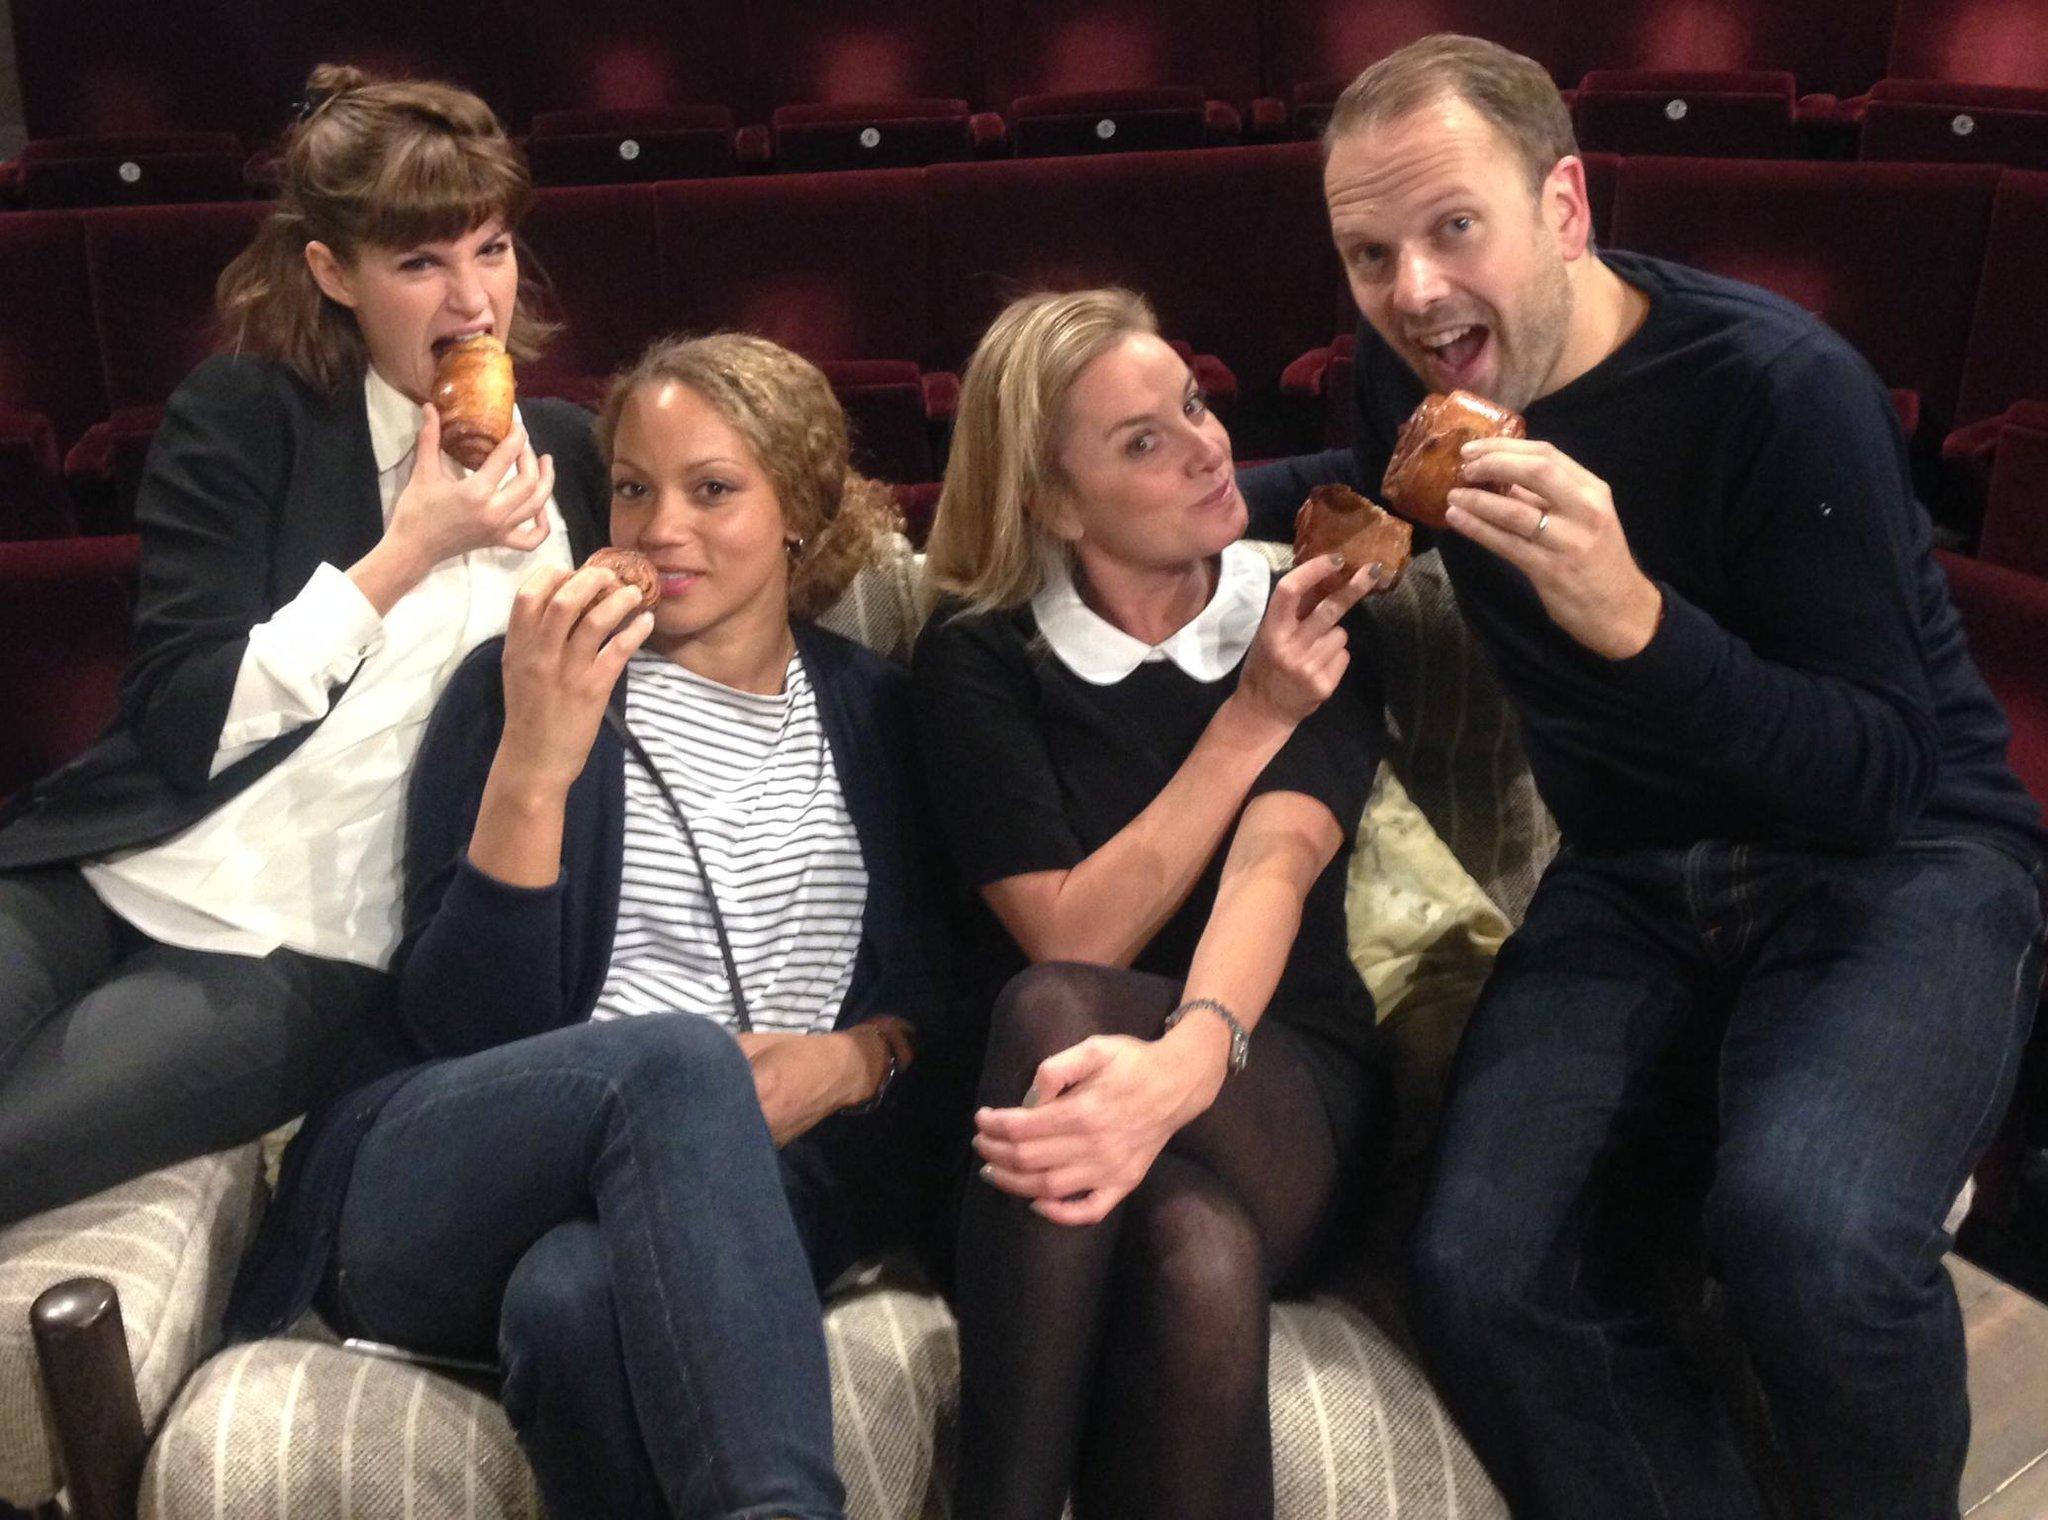 RT @BreedersPlay: Our fab cast @CaptainPooper @Angela_Griffin @mouthwaite @nicheburns enjoying @nordicbakery's brilliant cinnamon rolls htt…